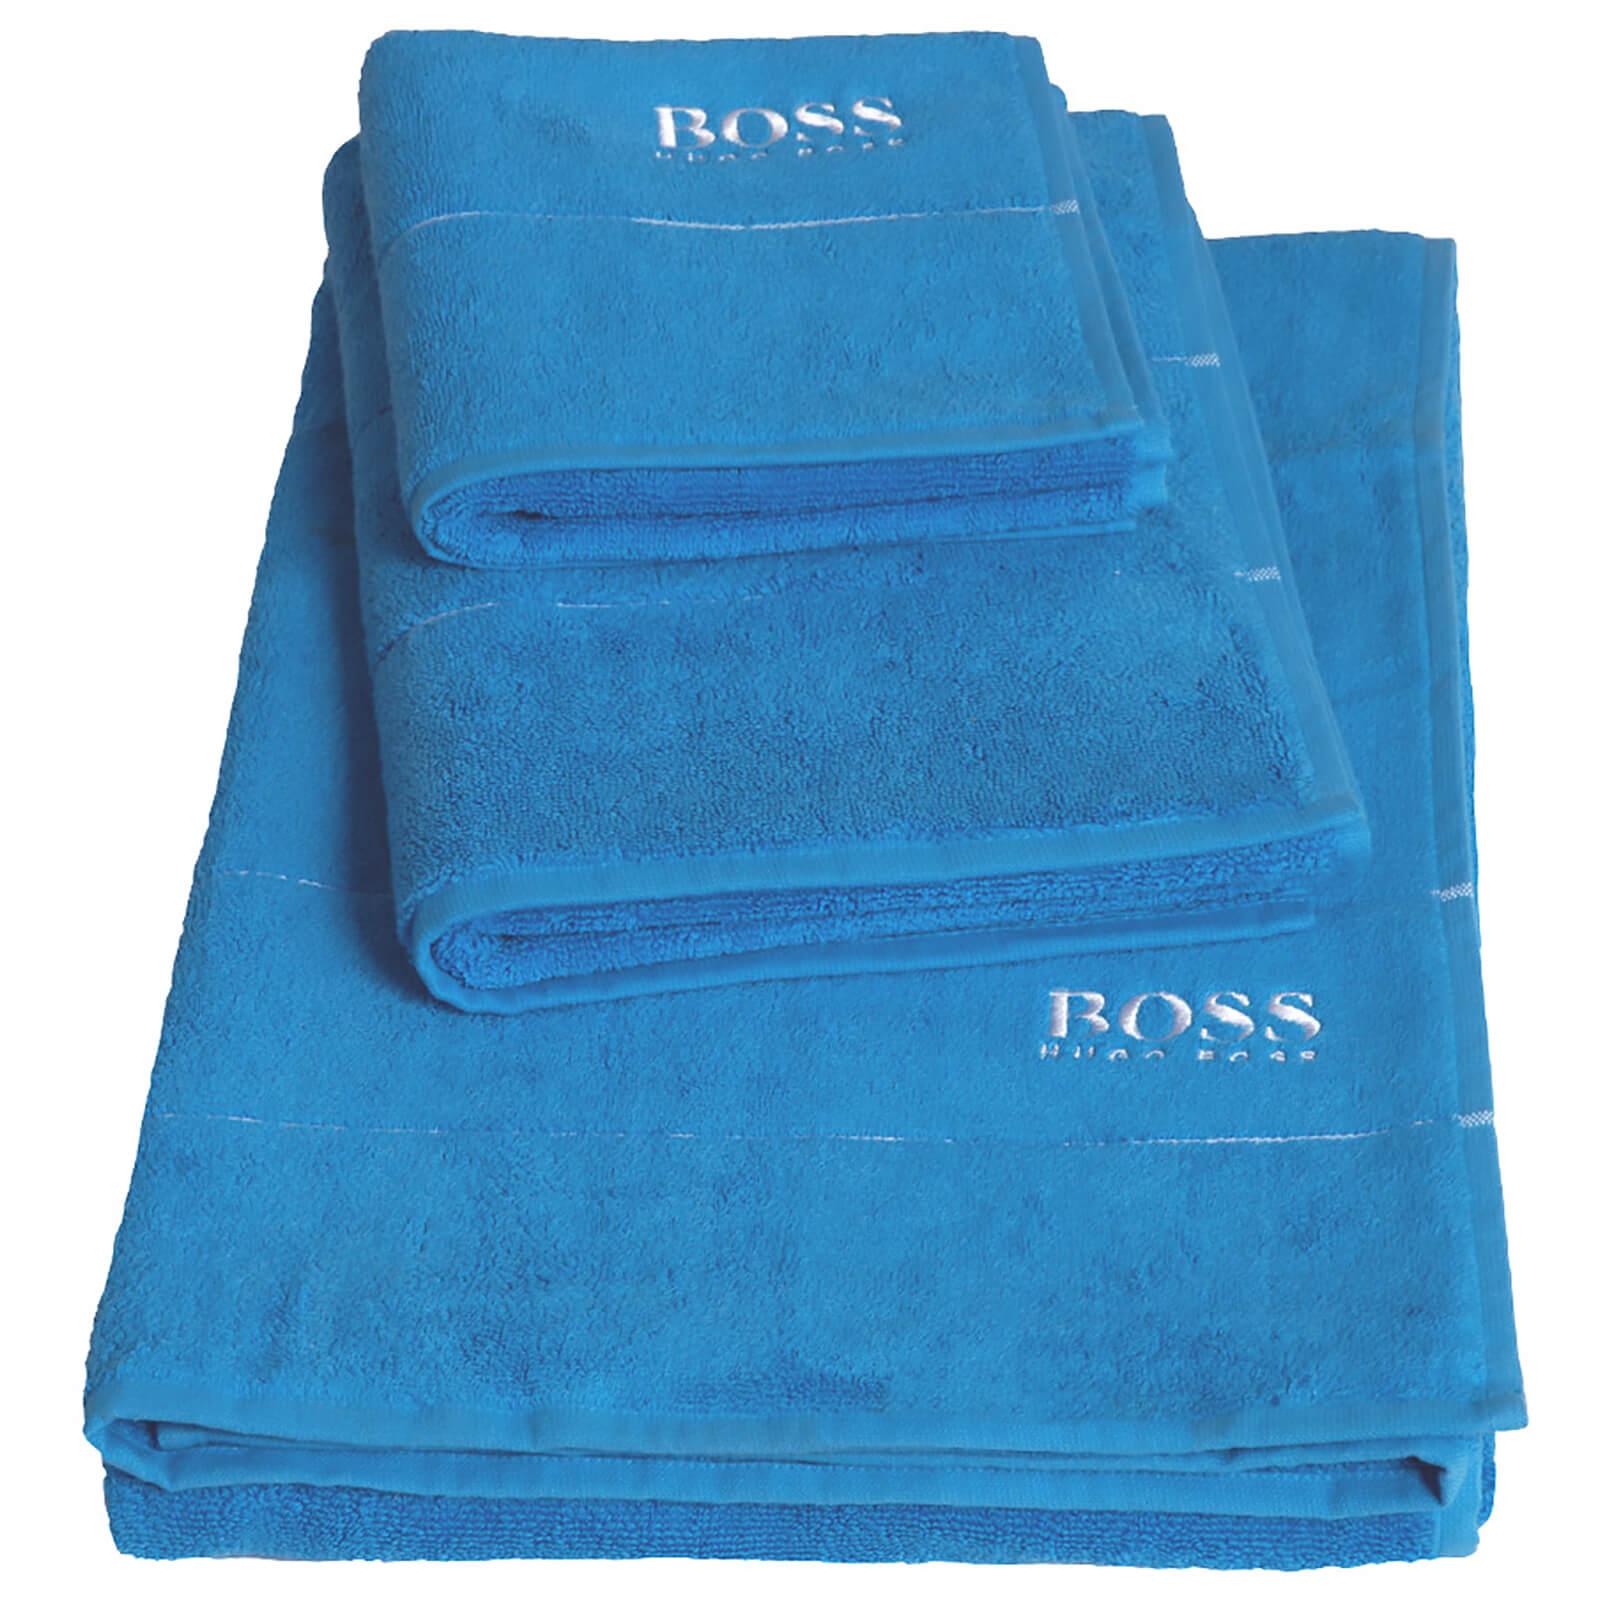 Hugo Boss Plain Towels - Pool - Bath Sheet - Blue